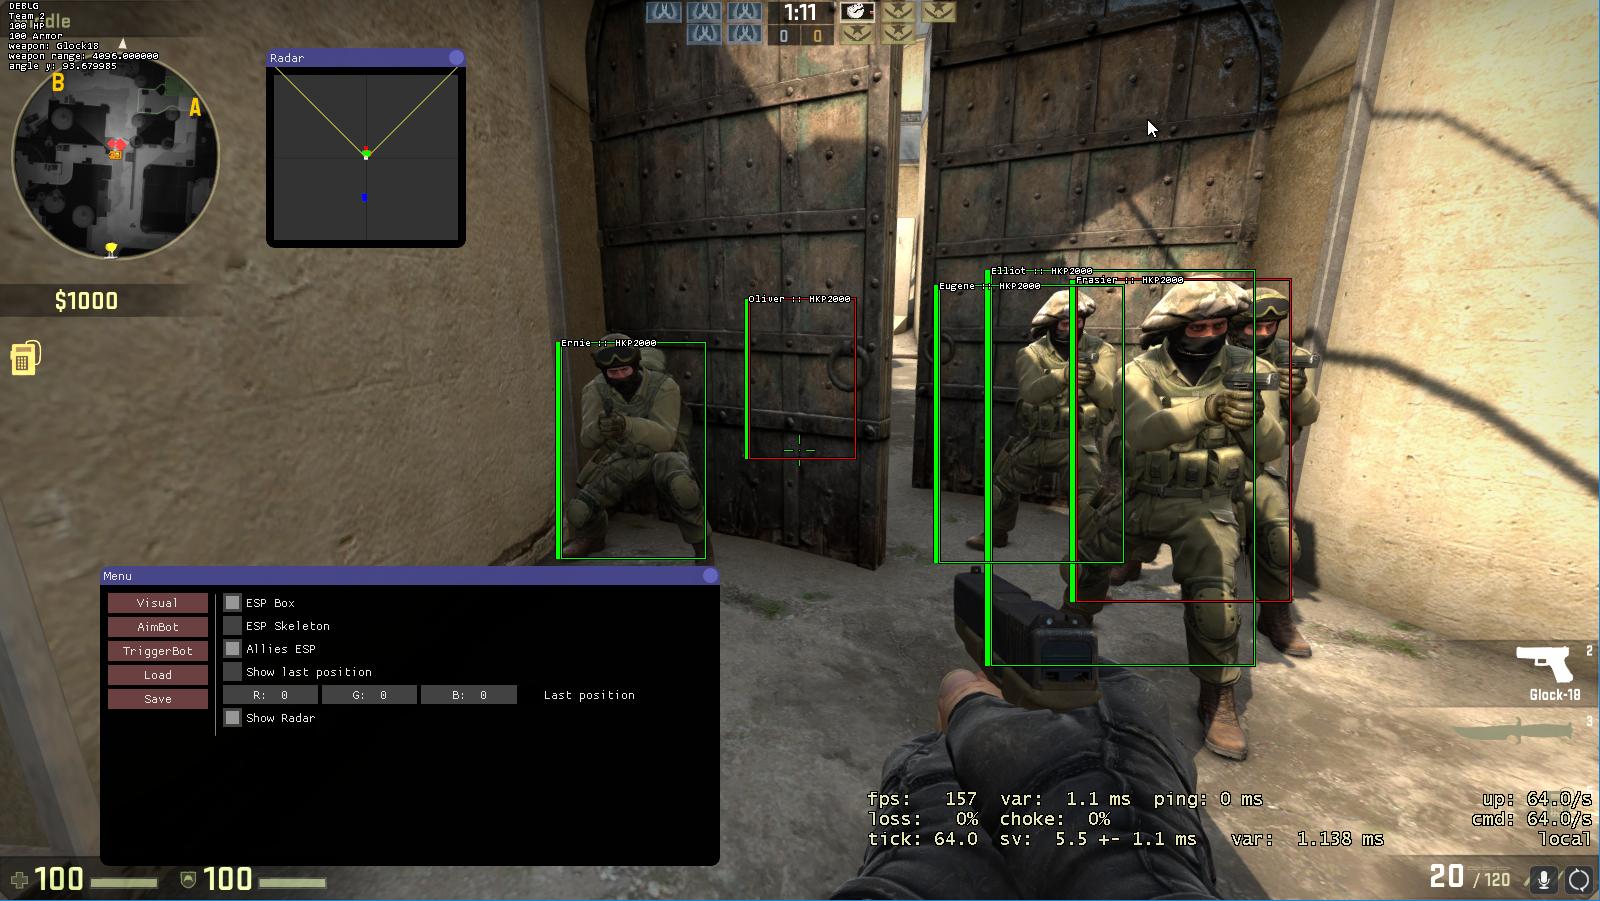 GitHub - DimitriFourny/csgo-hack: Counter-Strike: Global Offensive Hack